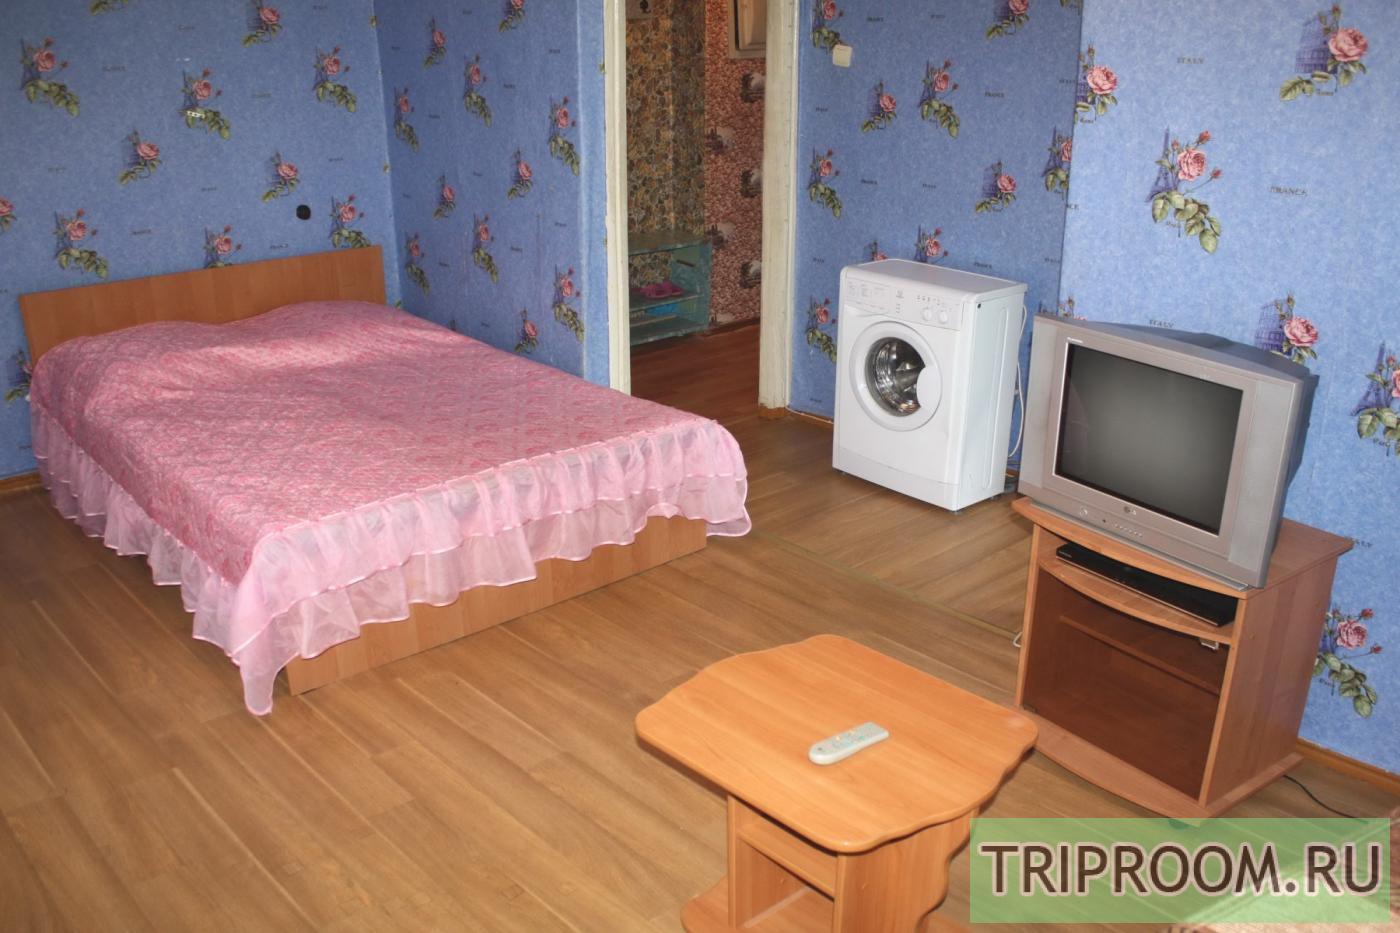 1-комнатная квартира посуточно (вариант № 21779), ул. Красная улица, фото № 2